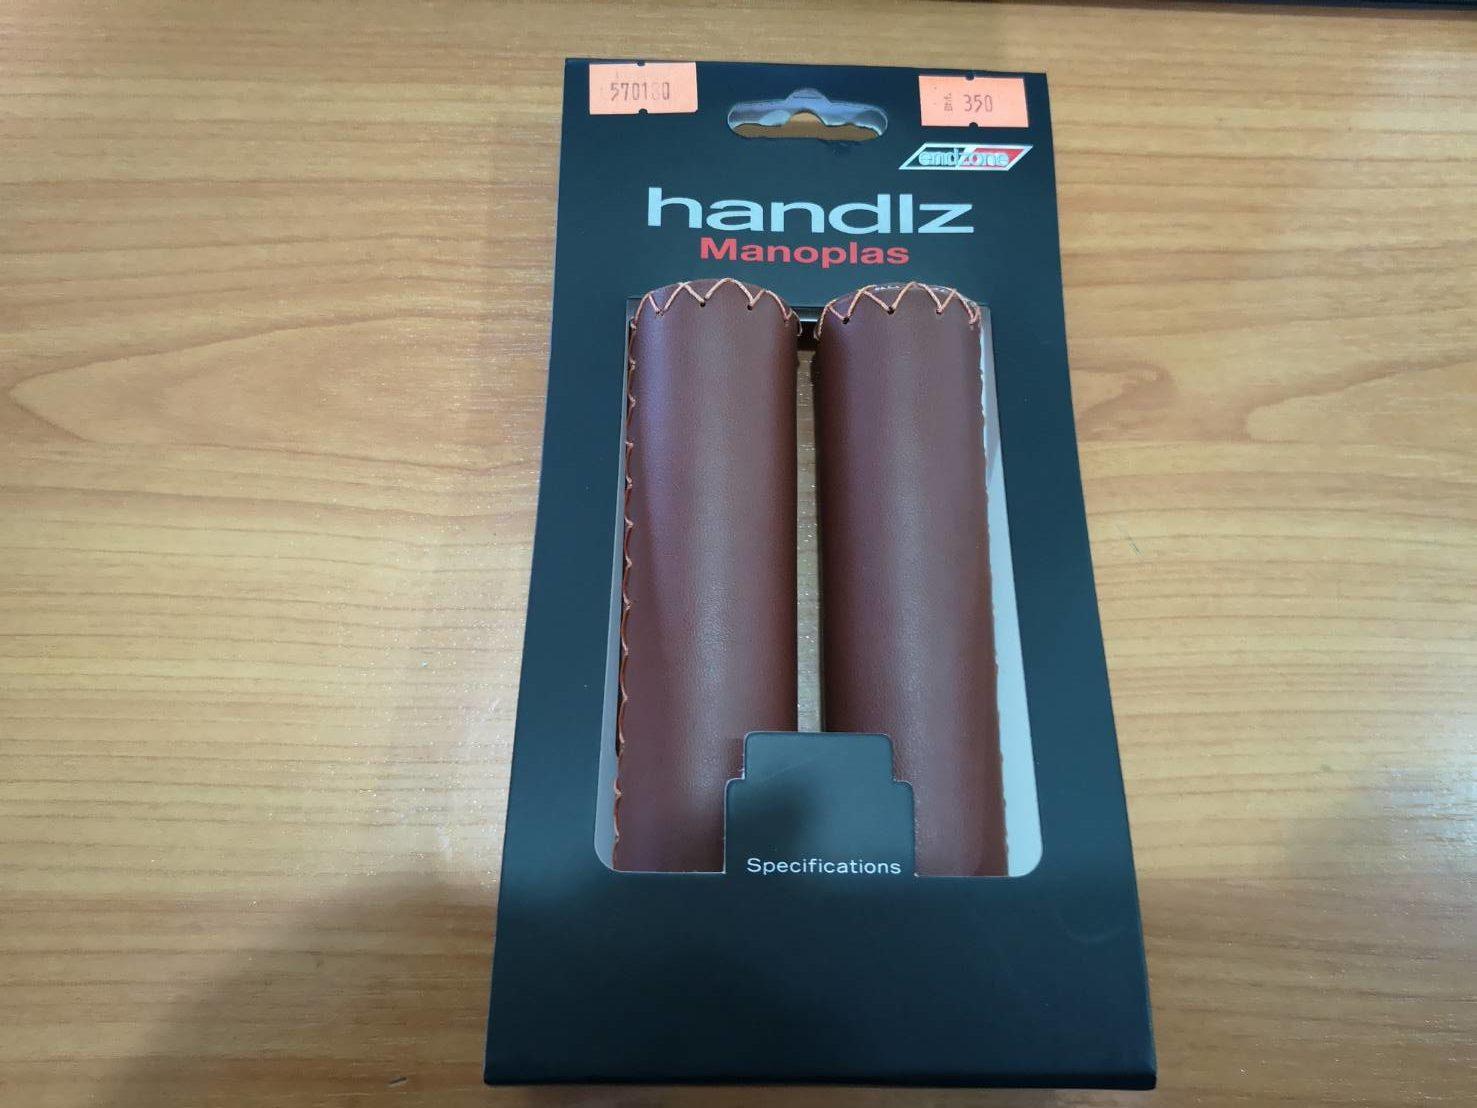 GR-0392 HANDLZ MANONPLAS